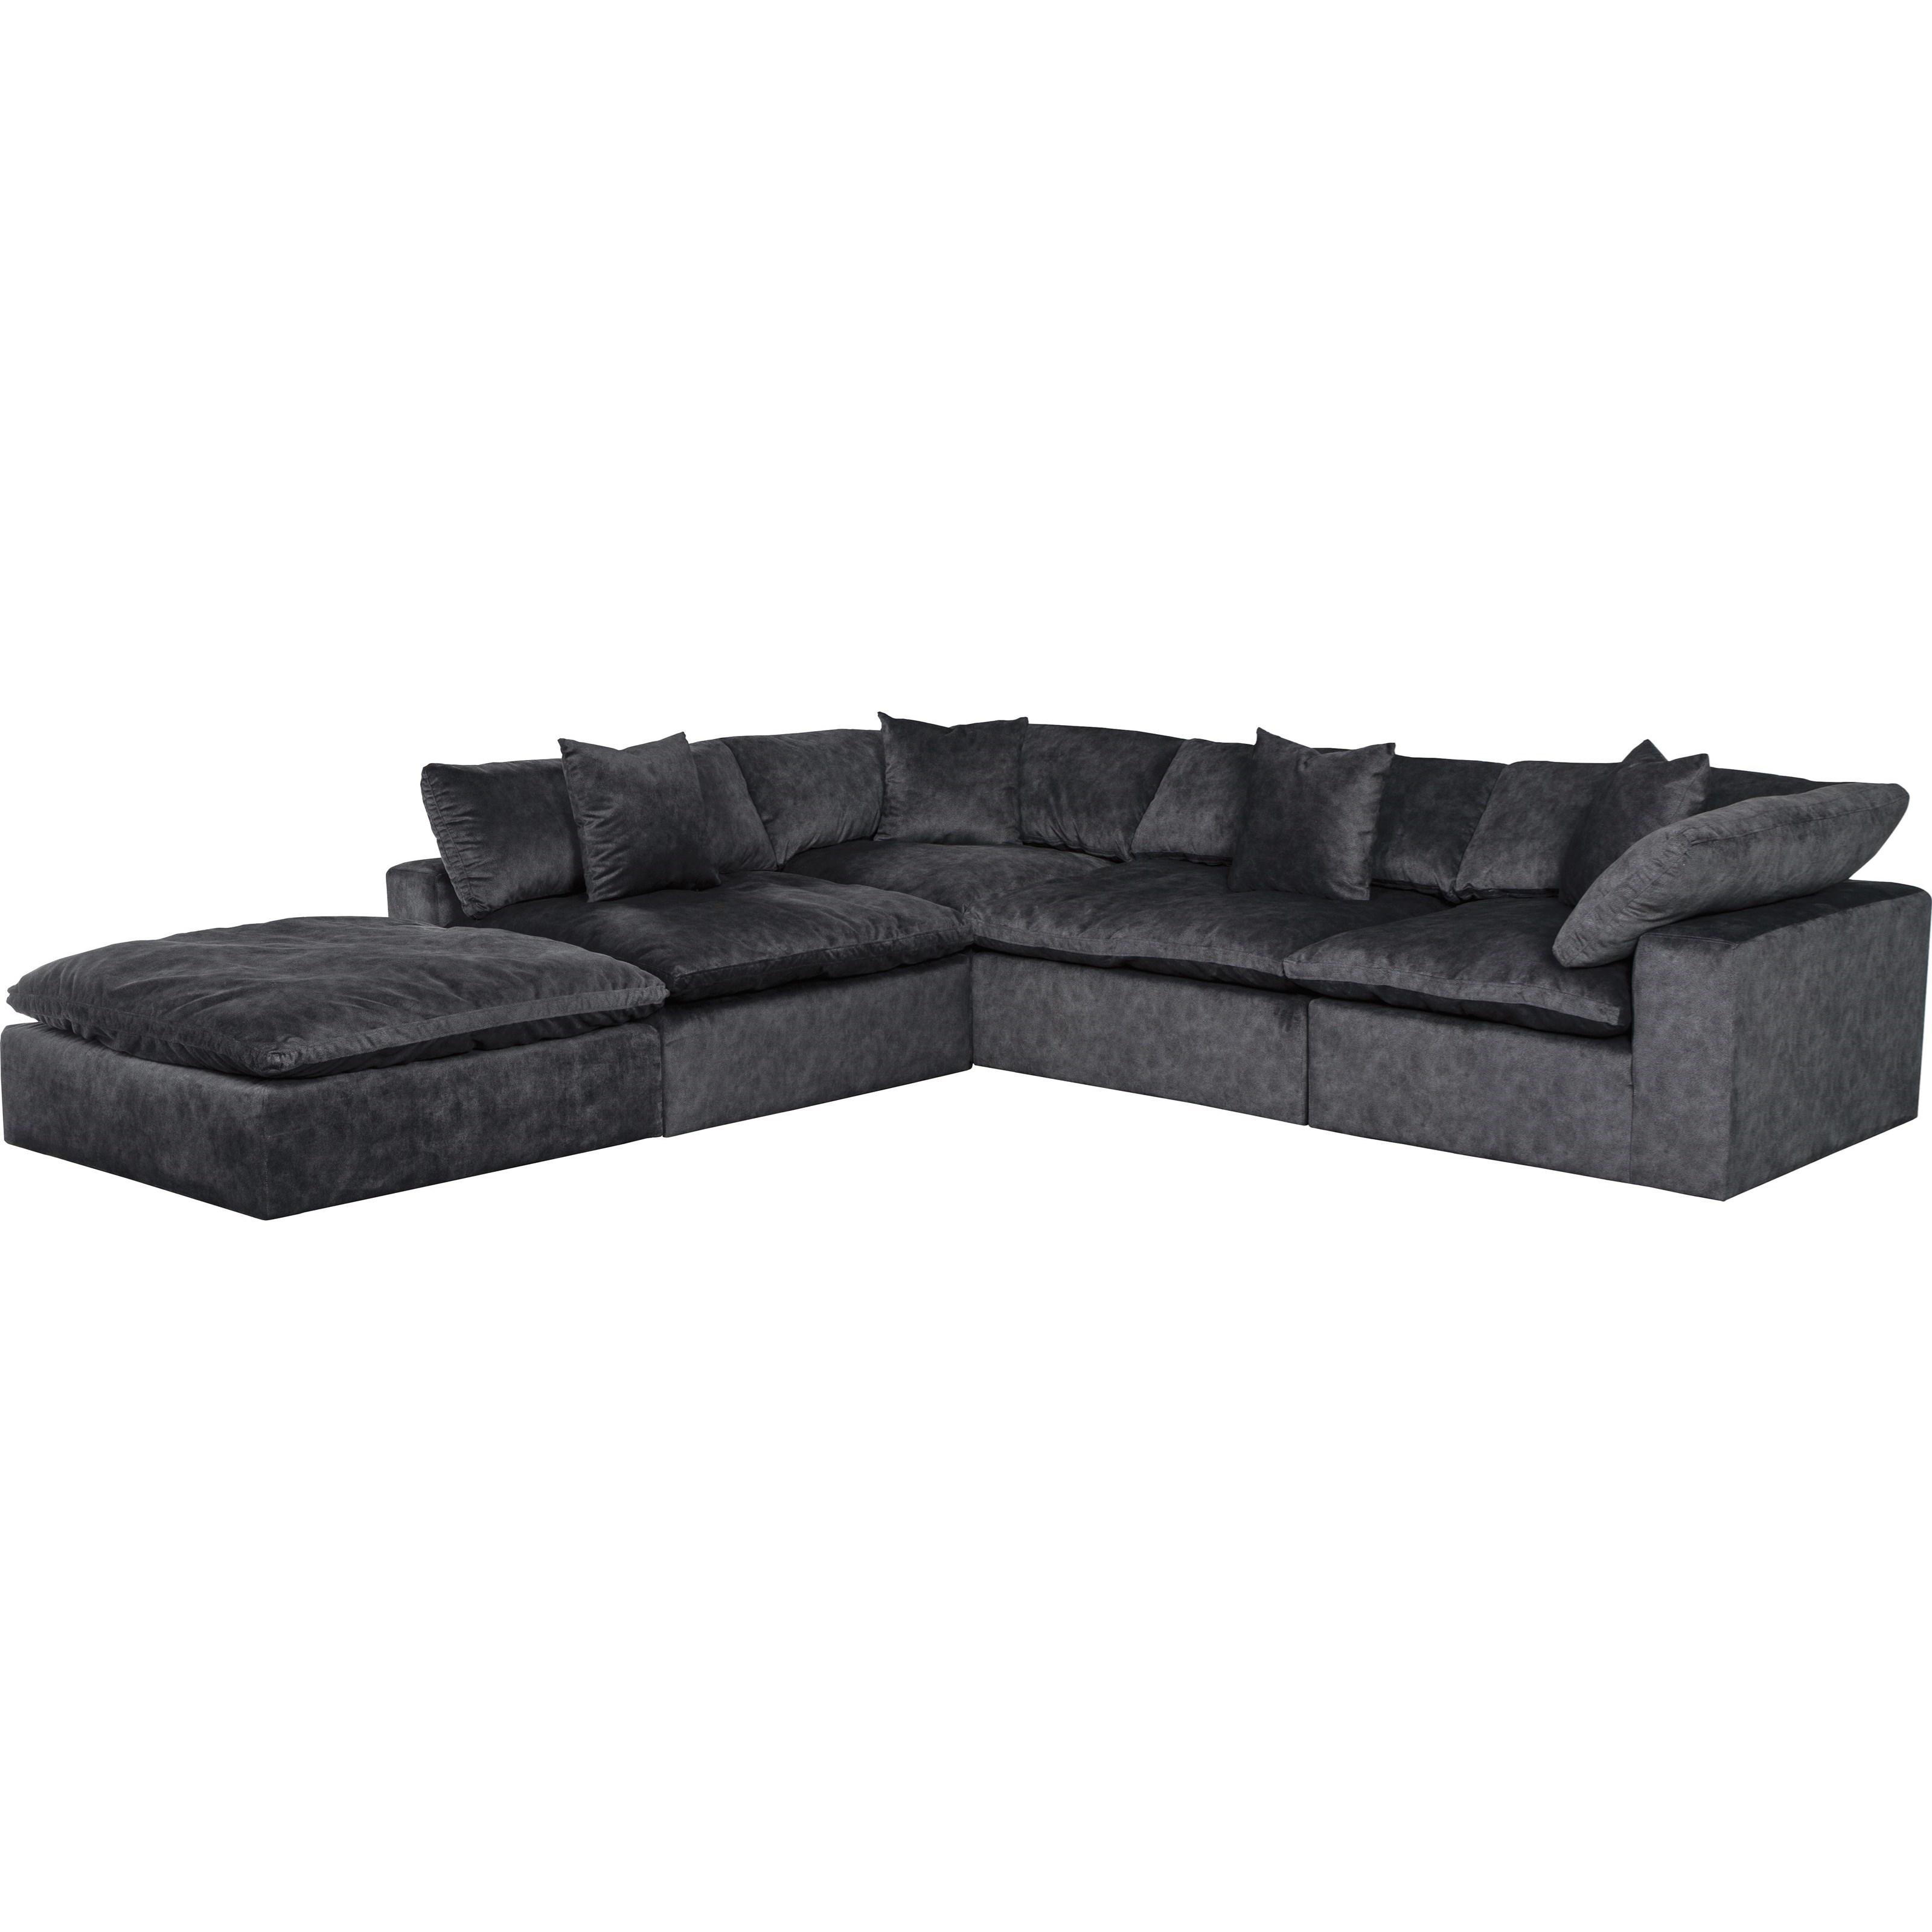 Plush L Shaped Sectional Sofa